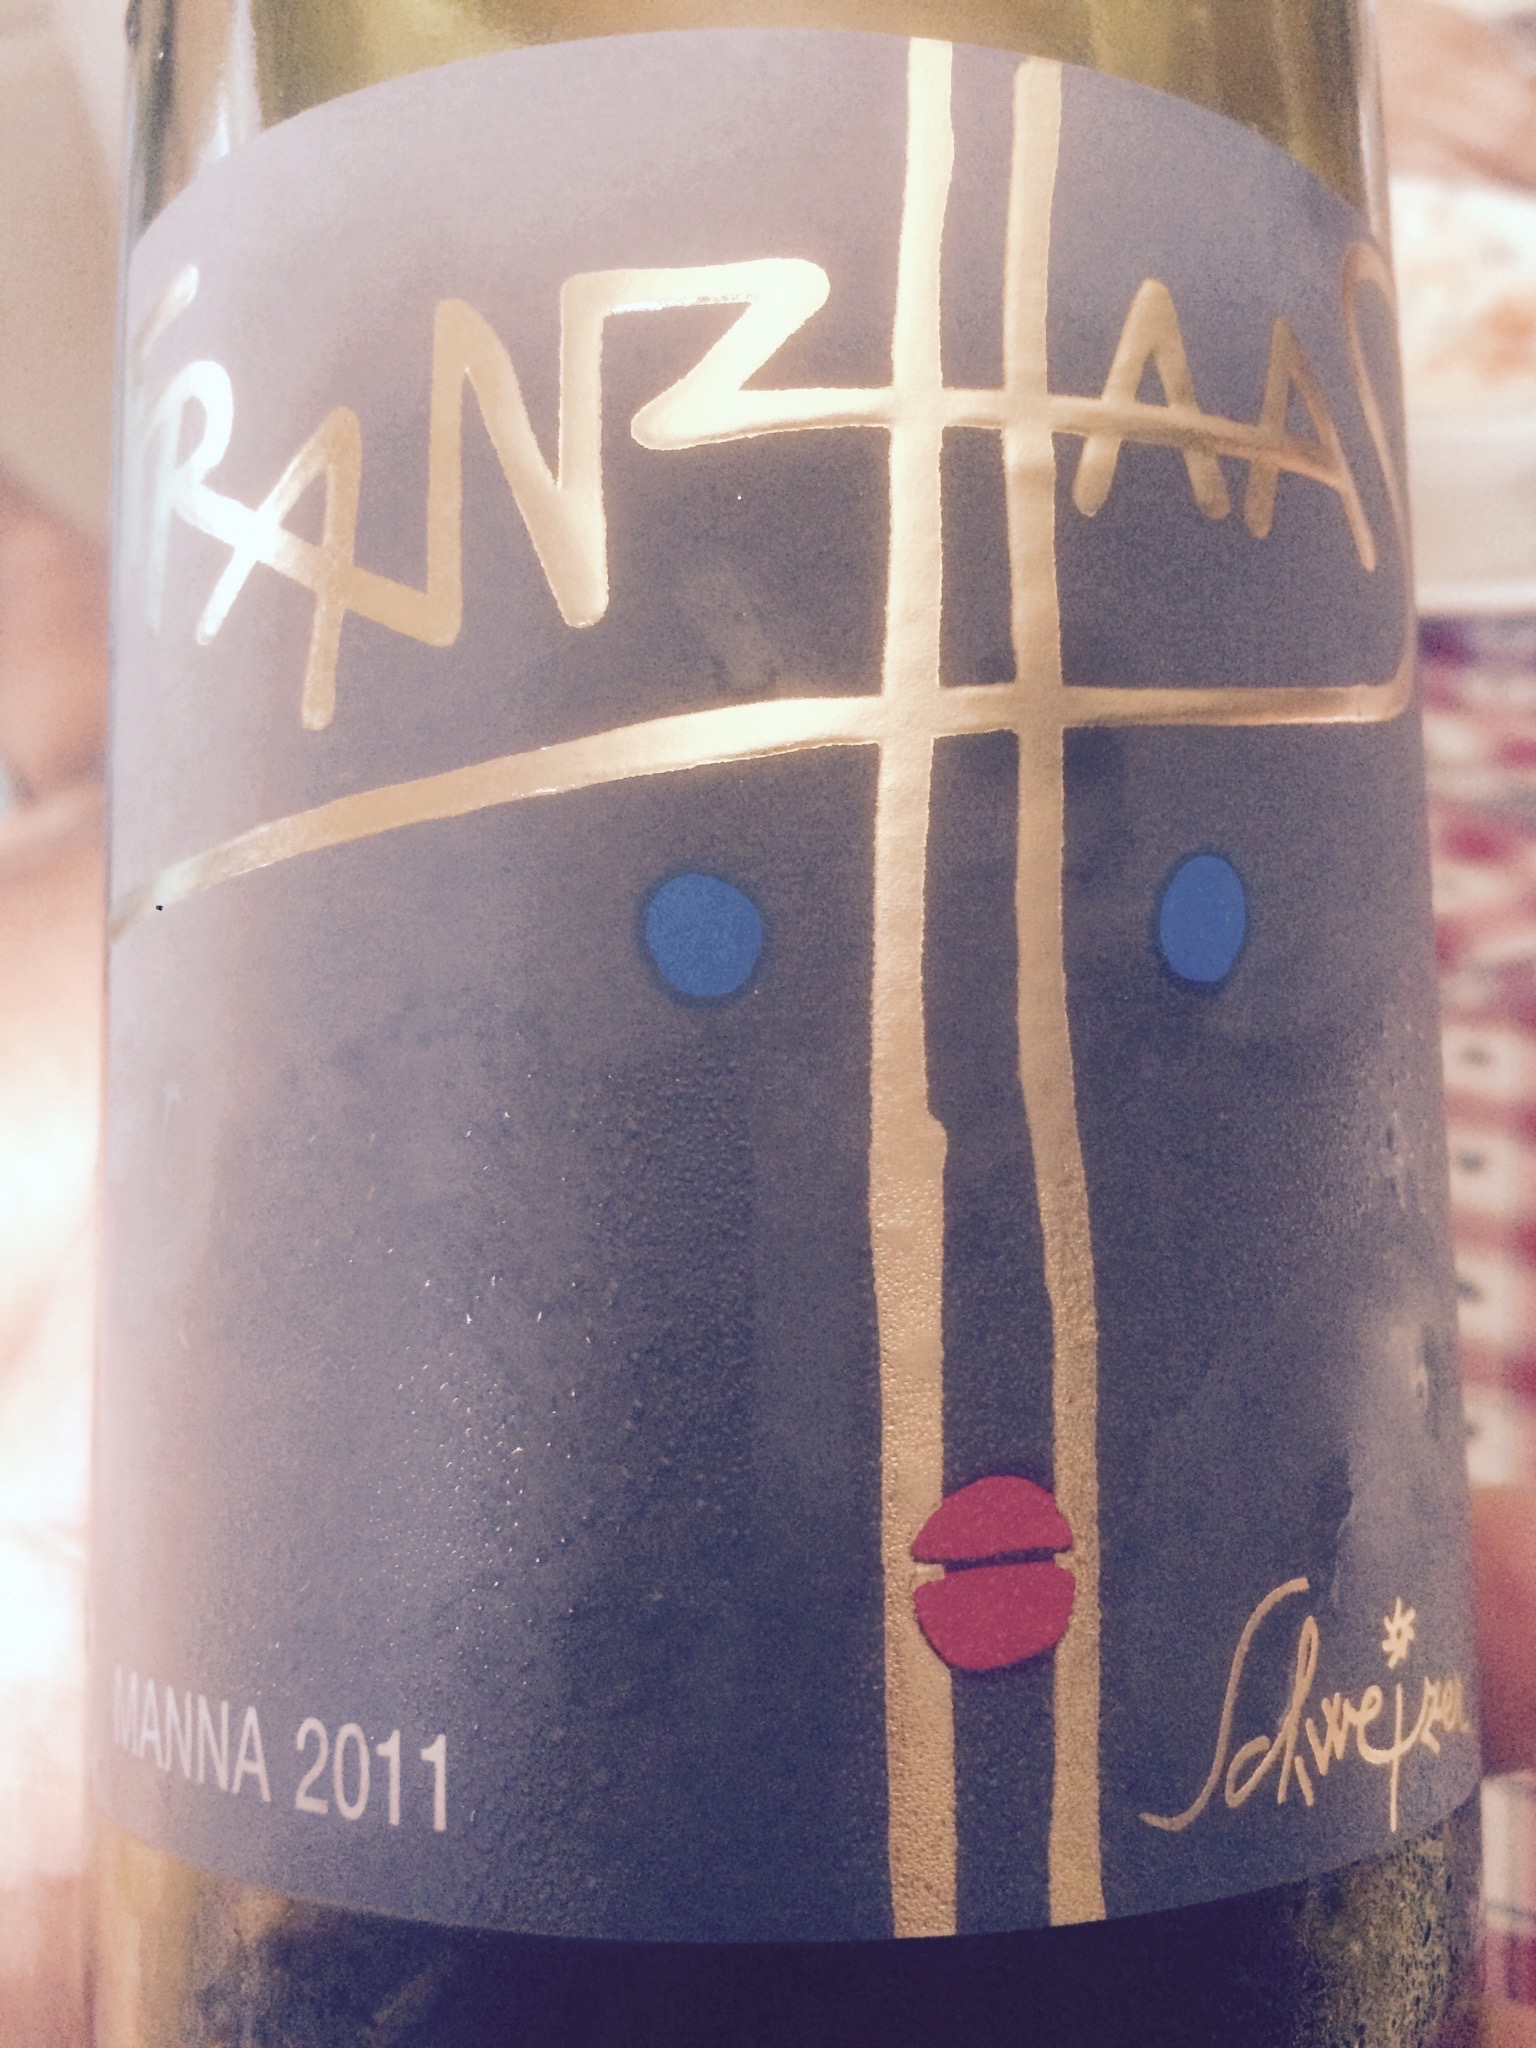 Manna 2011 – Franz Haas